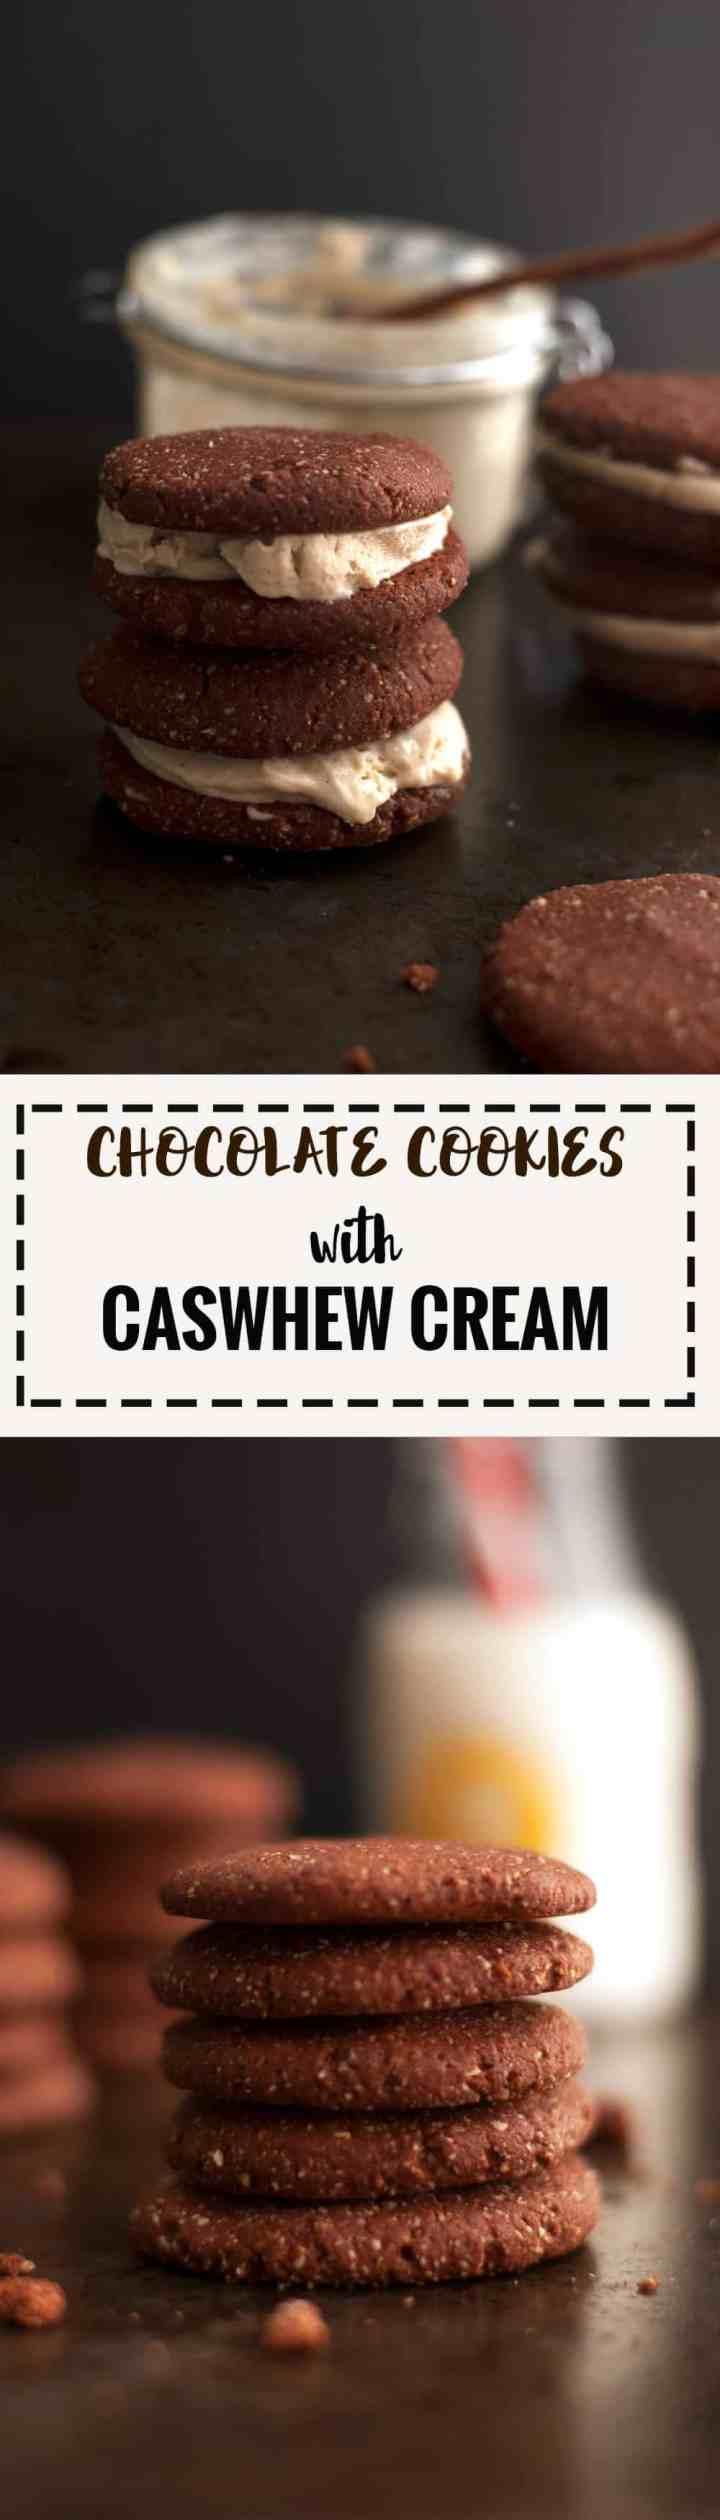 Choc-Cookies-with-Cream-Pinterest3